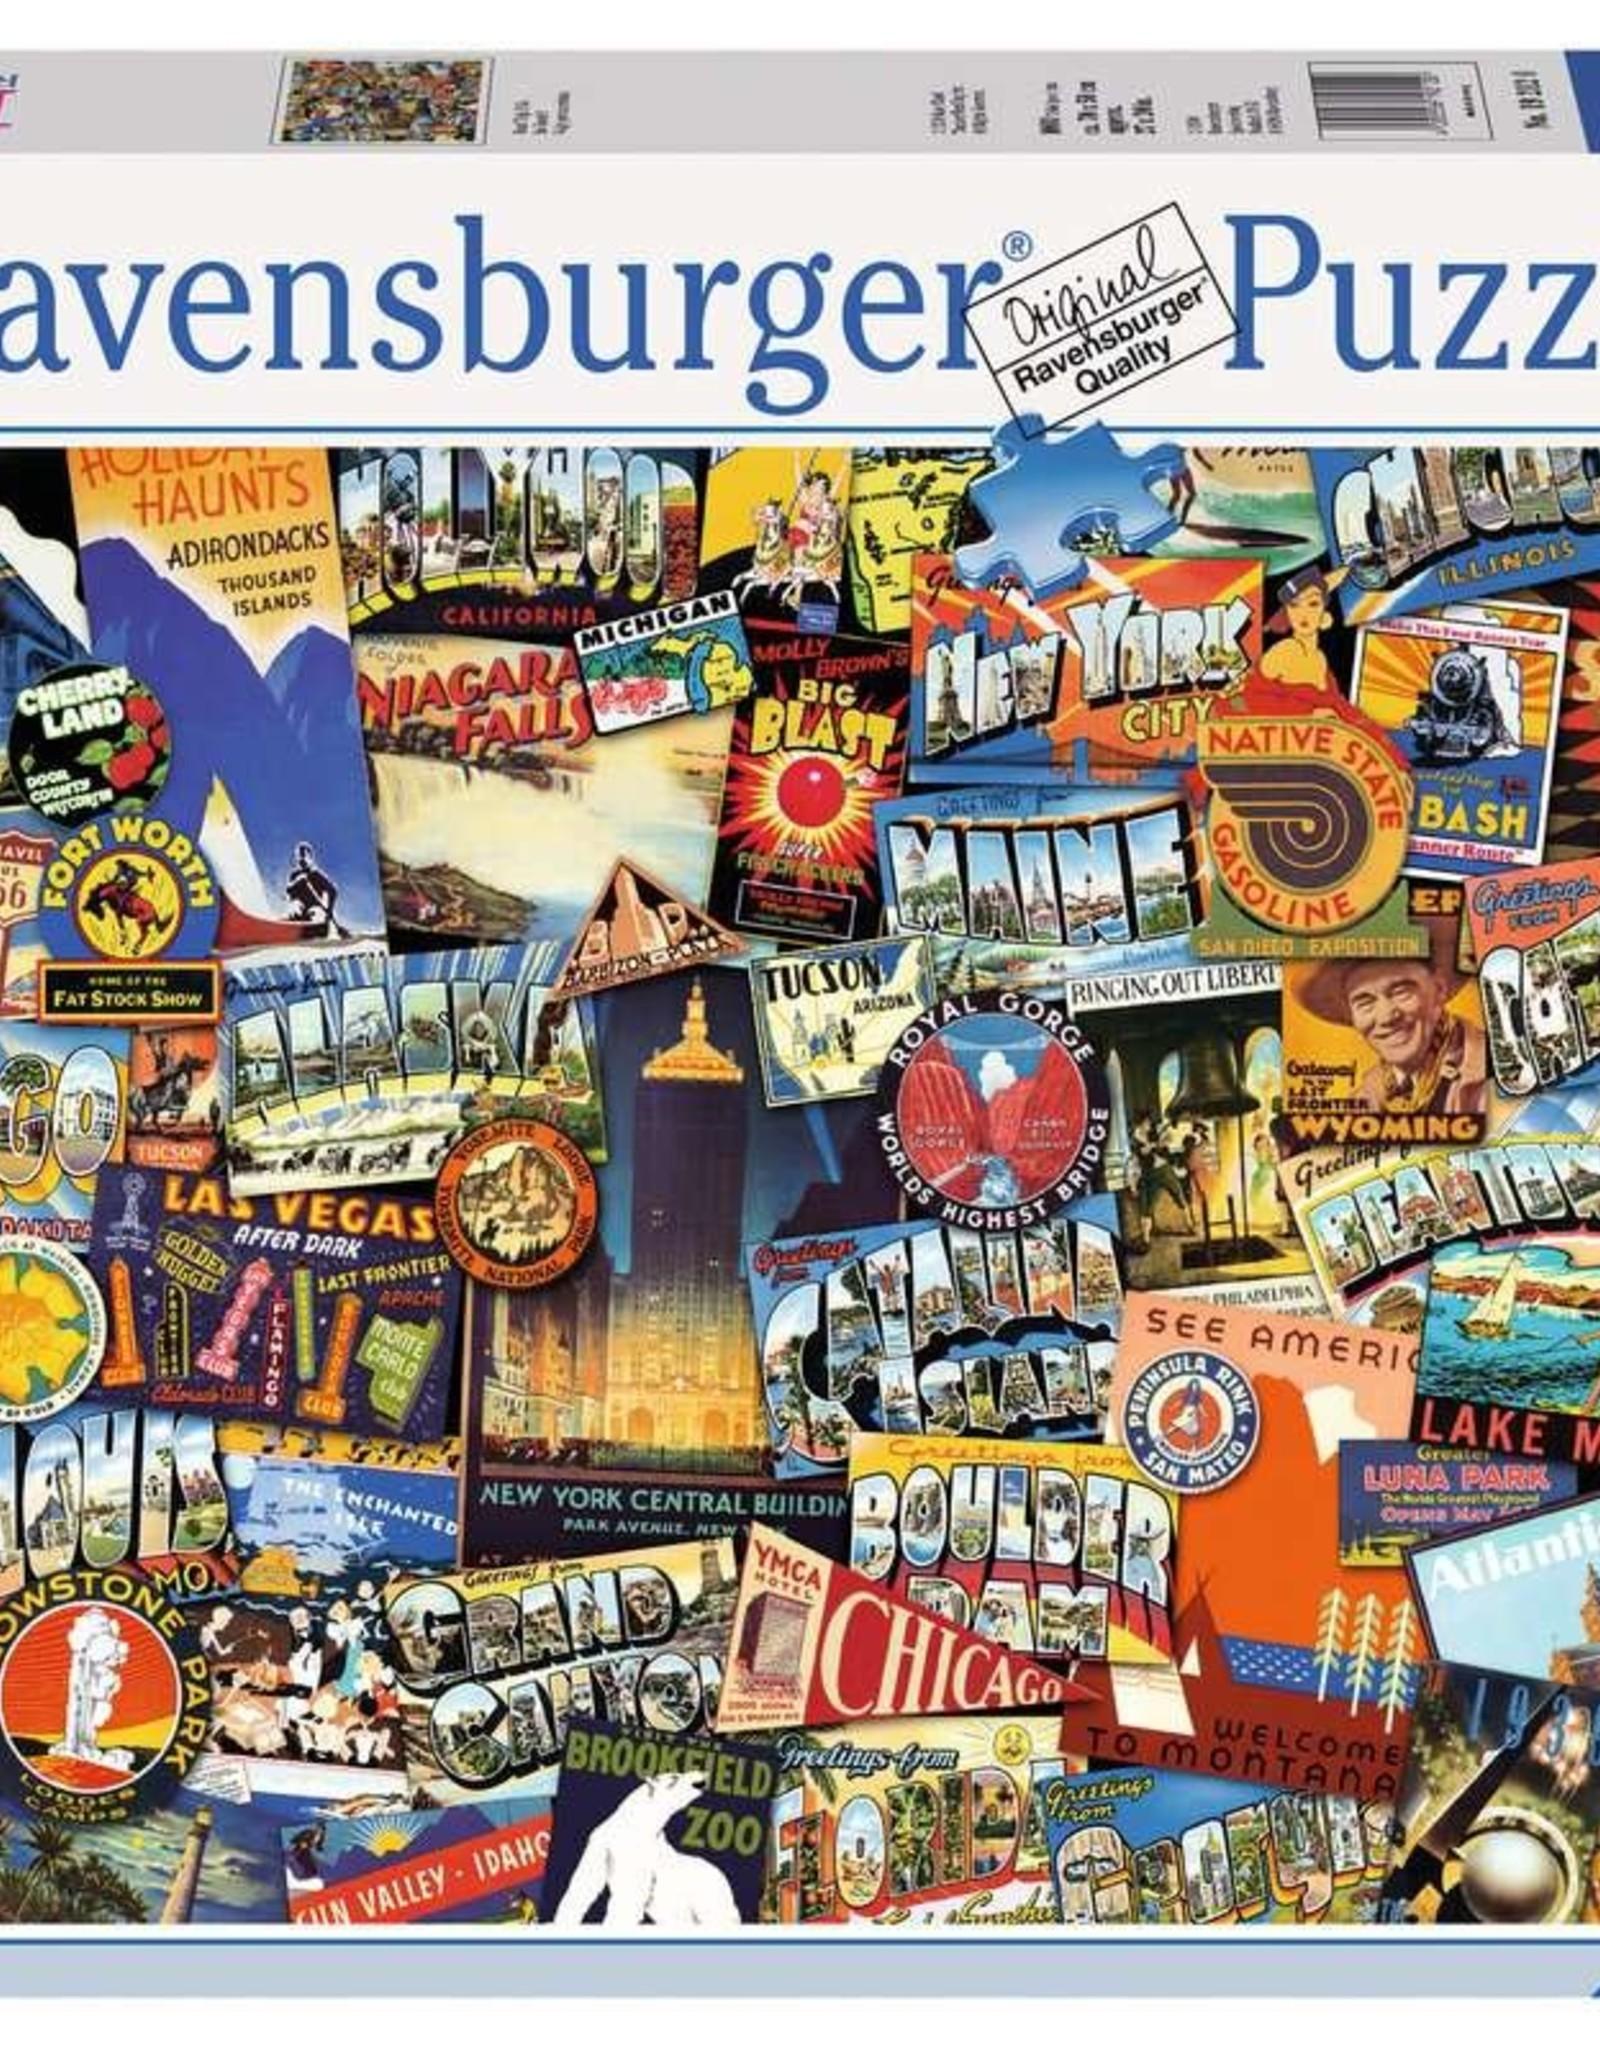 Ravensburger Puzzle 1000 pc: Road Trip USA